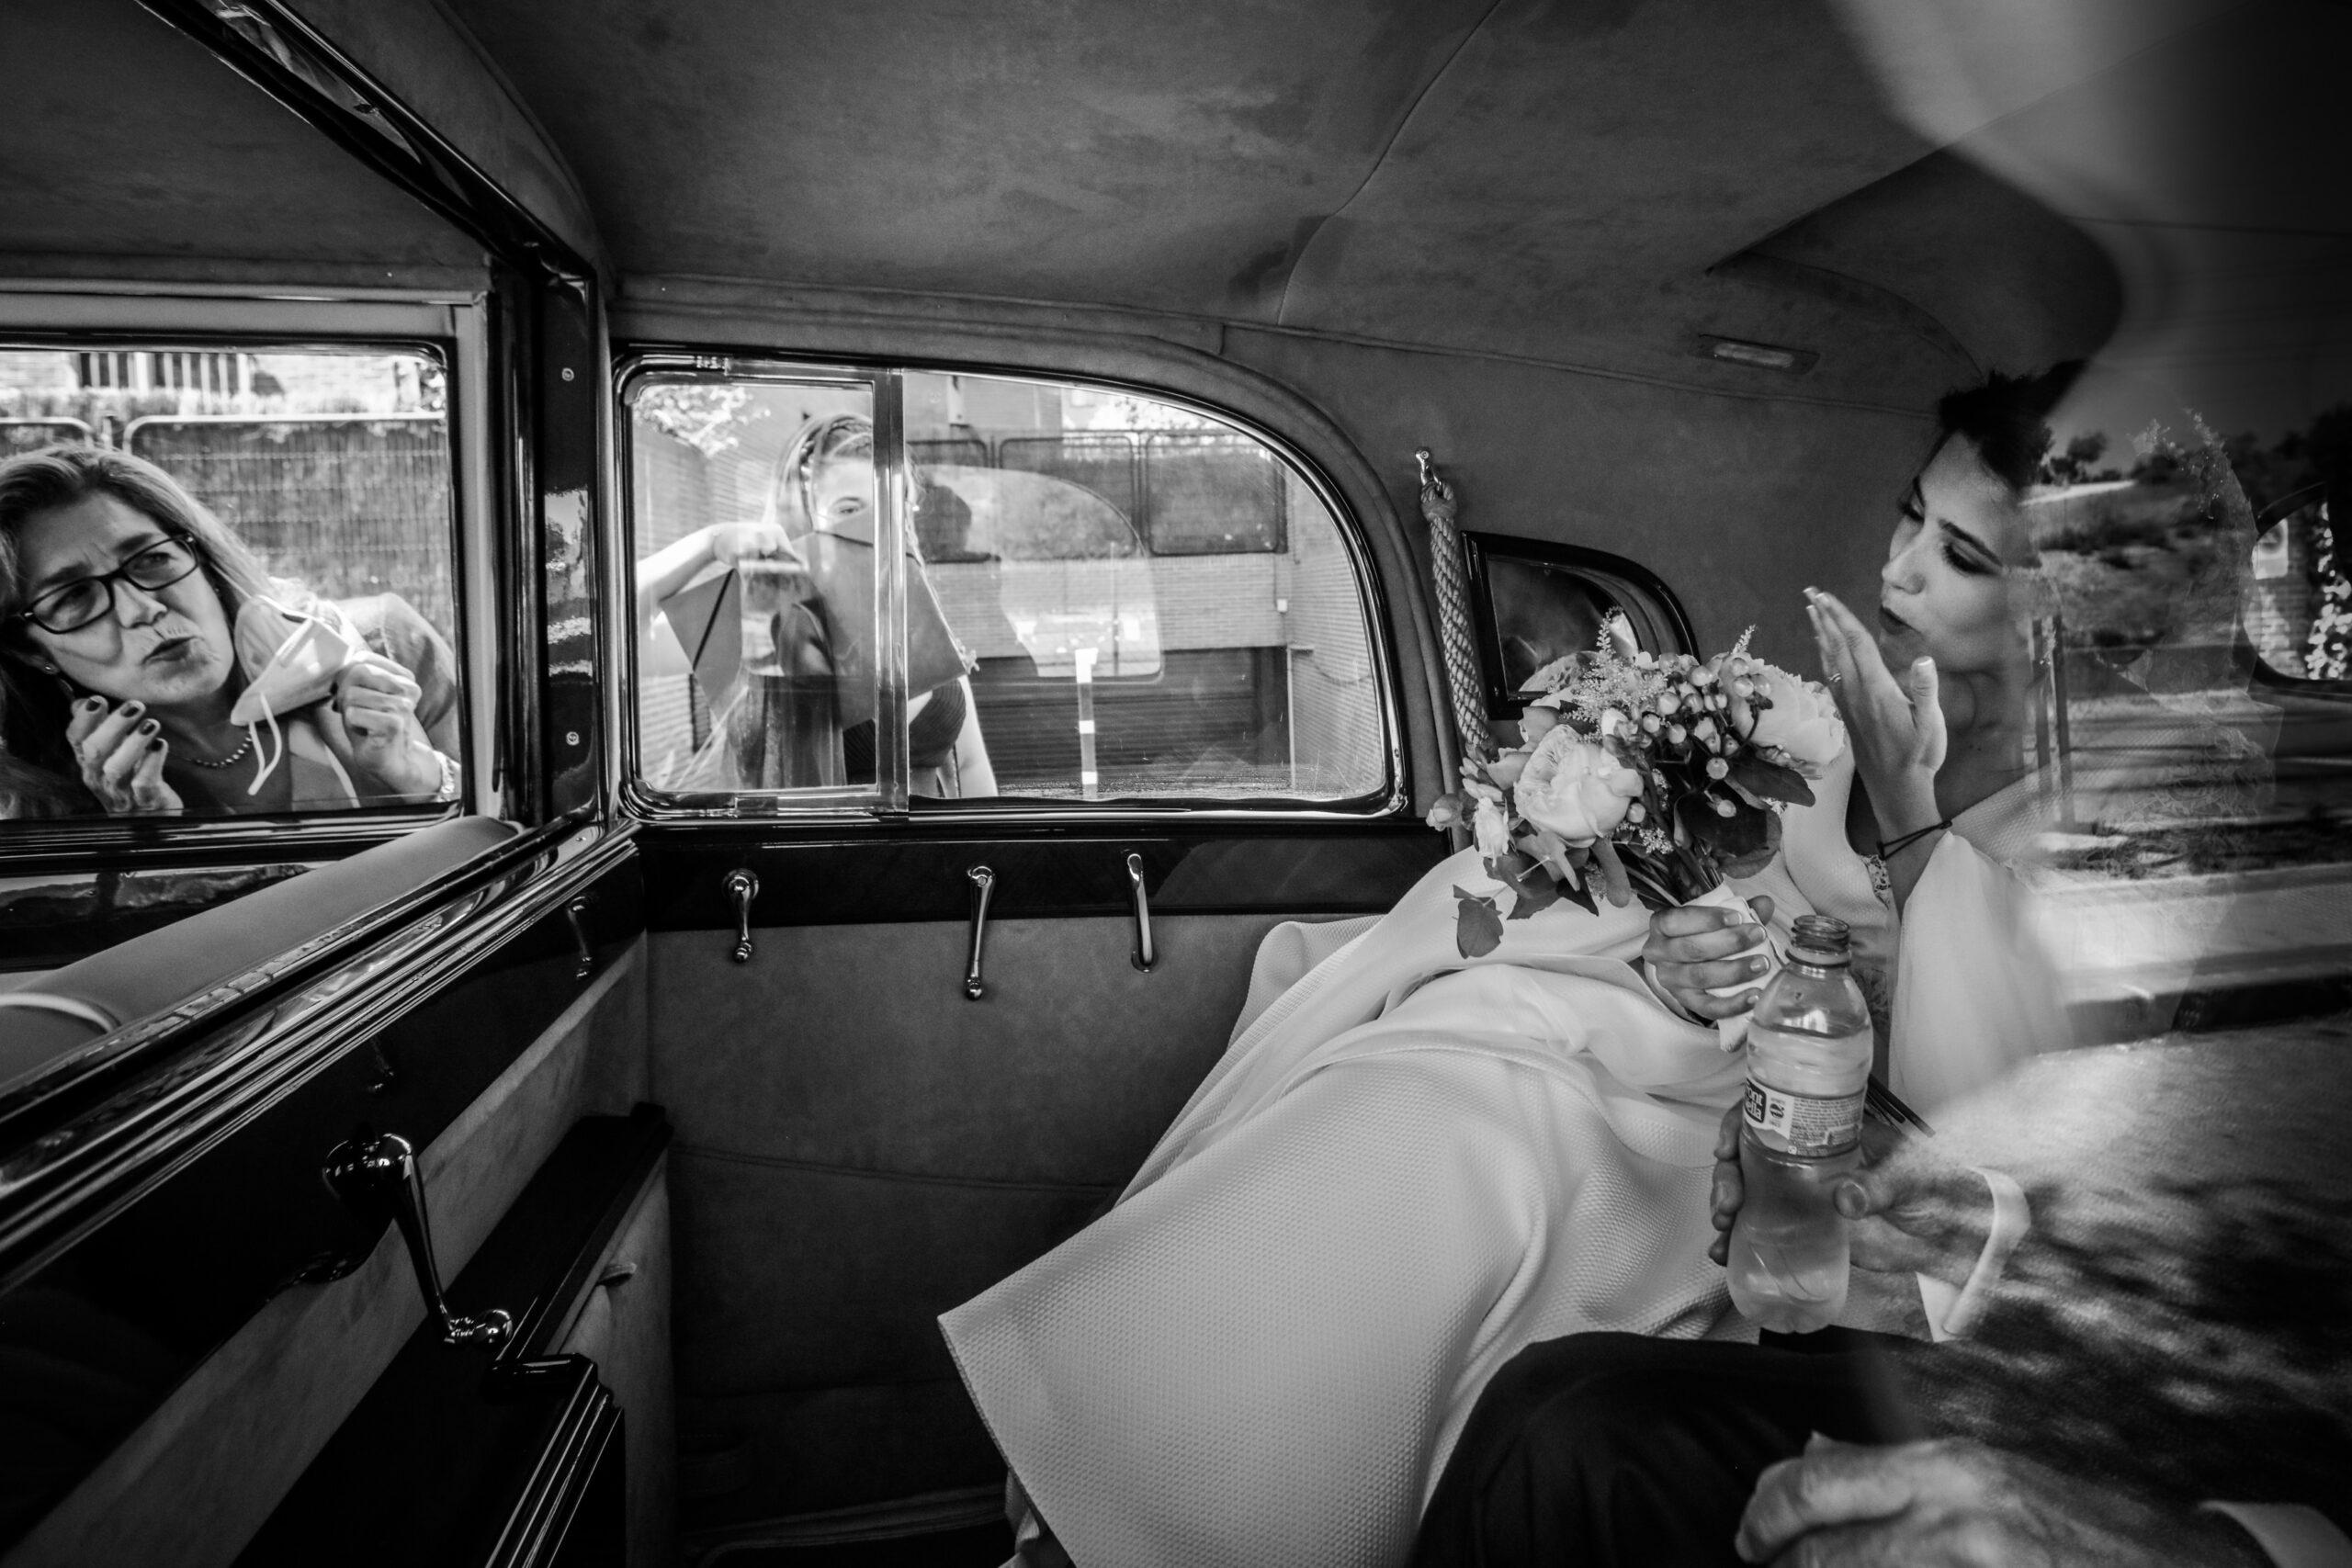 castillo de viñuelas, boda madrid, fotografo de boda, wedding planner madrid, wedding planner spain, get married spain, spain destination wedding, fotografia de bodas, wedding day, ceremonia religiosa, castillo, wedding inspiration, wedding ideas, wedding decoration, best day ever, bride, wedding dress, groom, novios, novia, wedding ring,